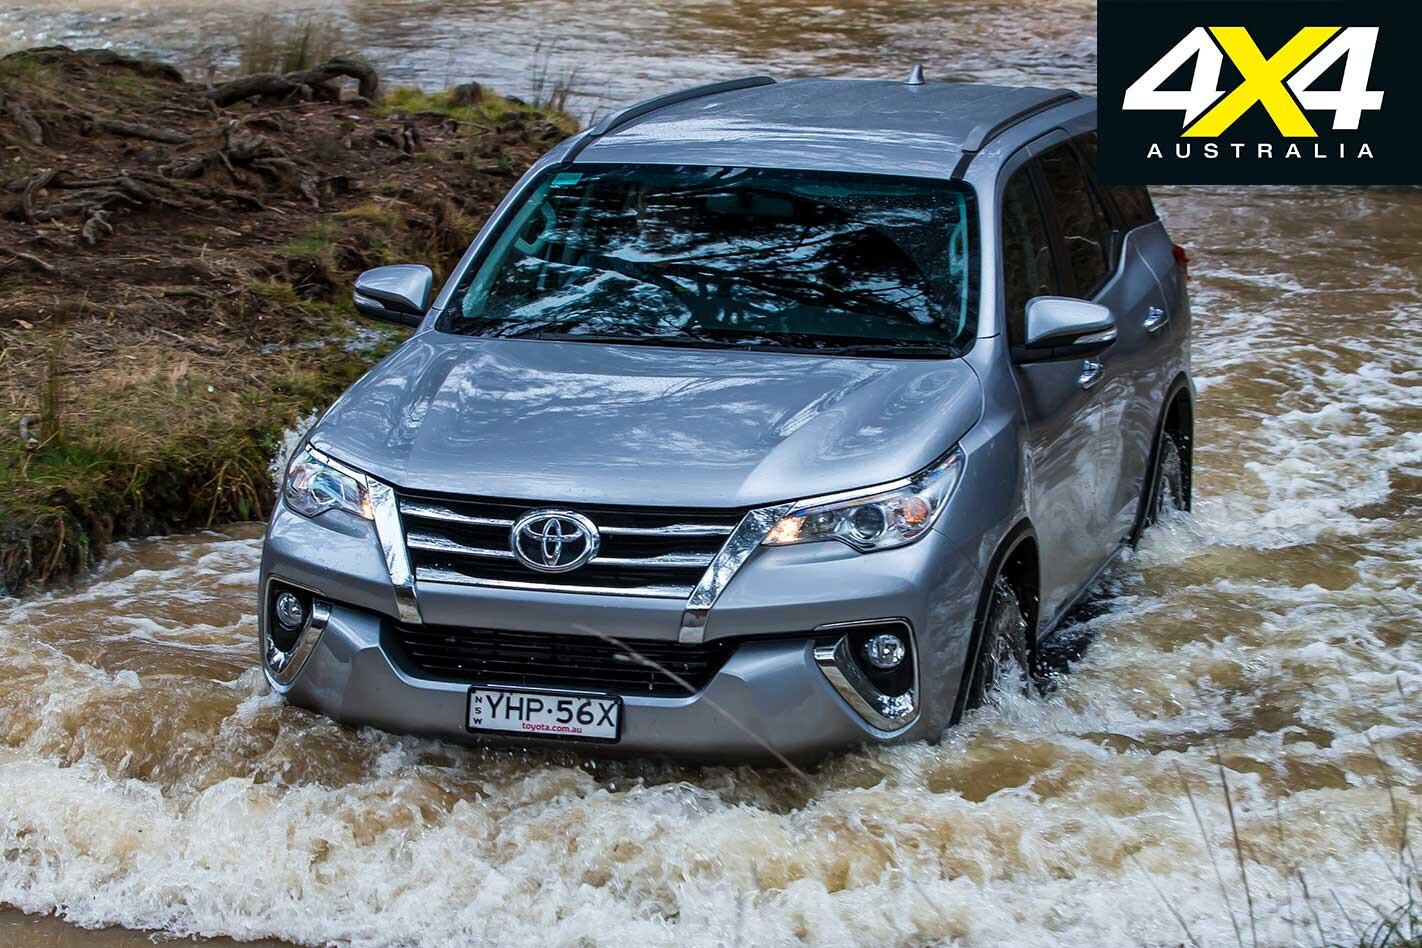 2018 Toyota Fortuner Front River Crossing Jpg